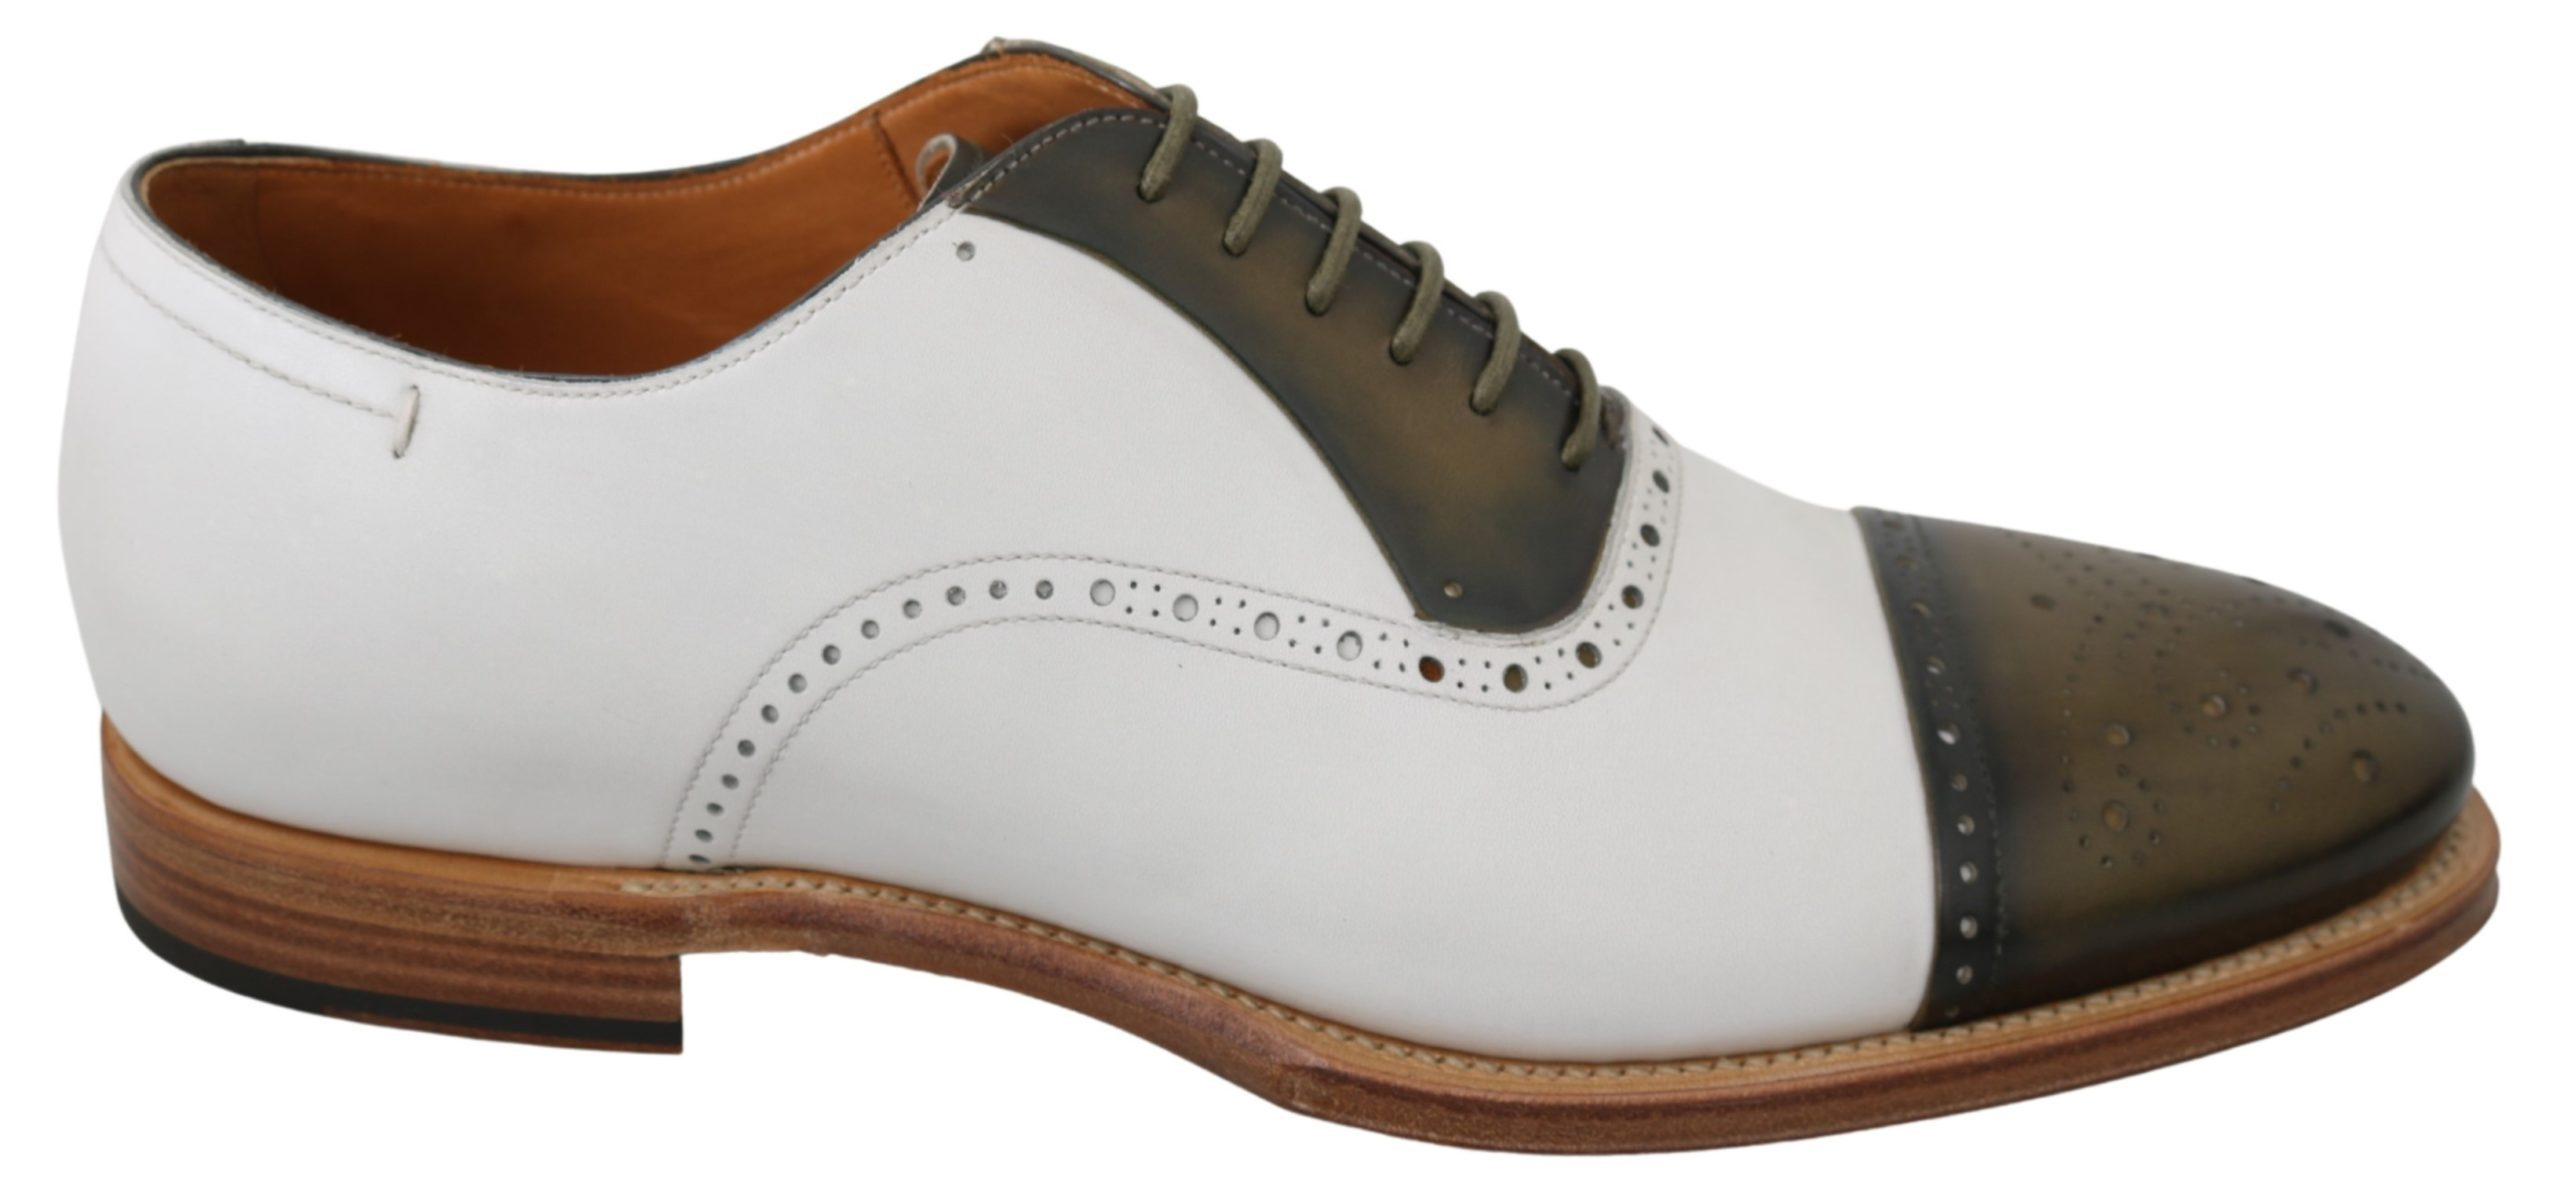 Dolce & Gabbana Men's Leather Derby Brogue Shoe White MV2882 - EU44/US11